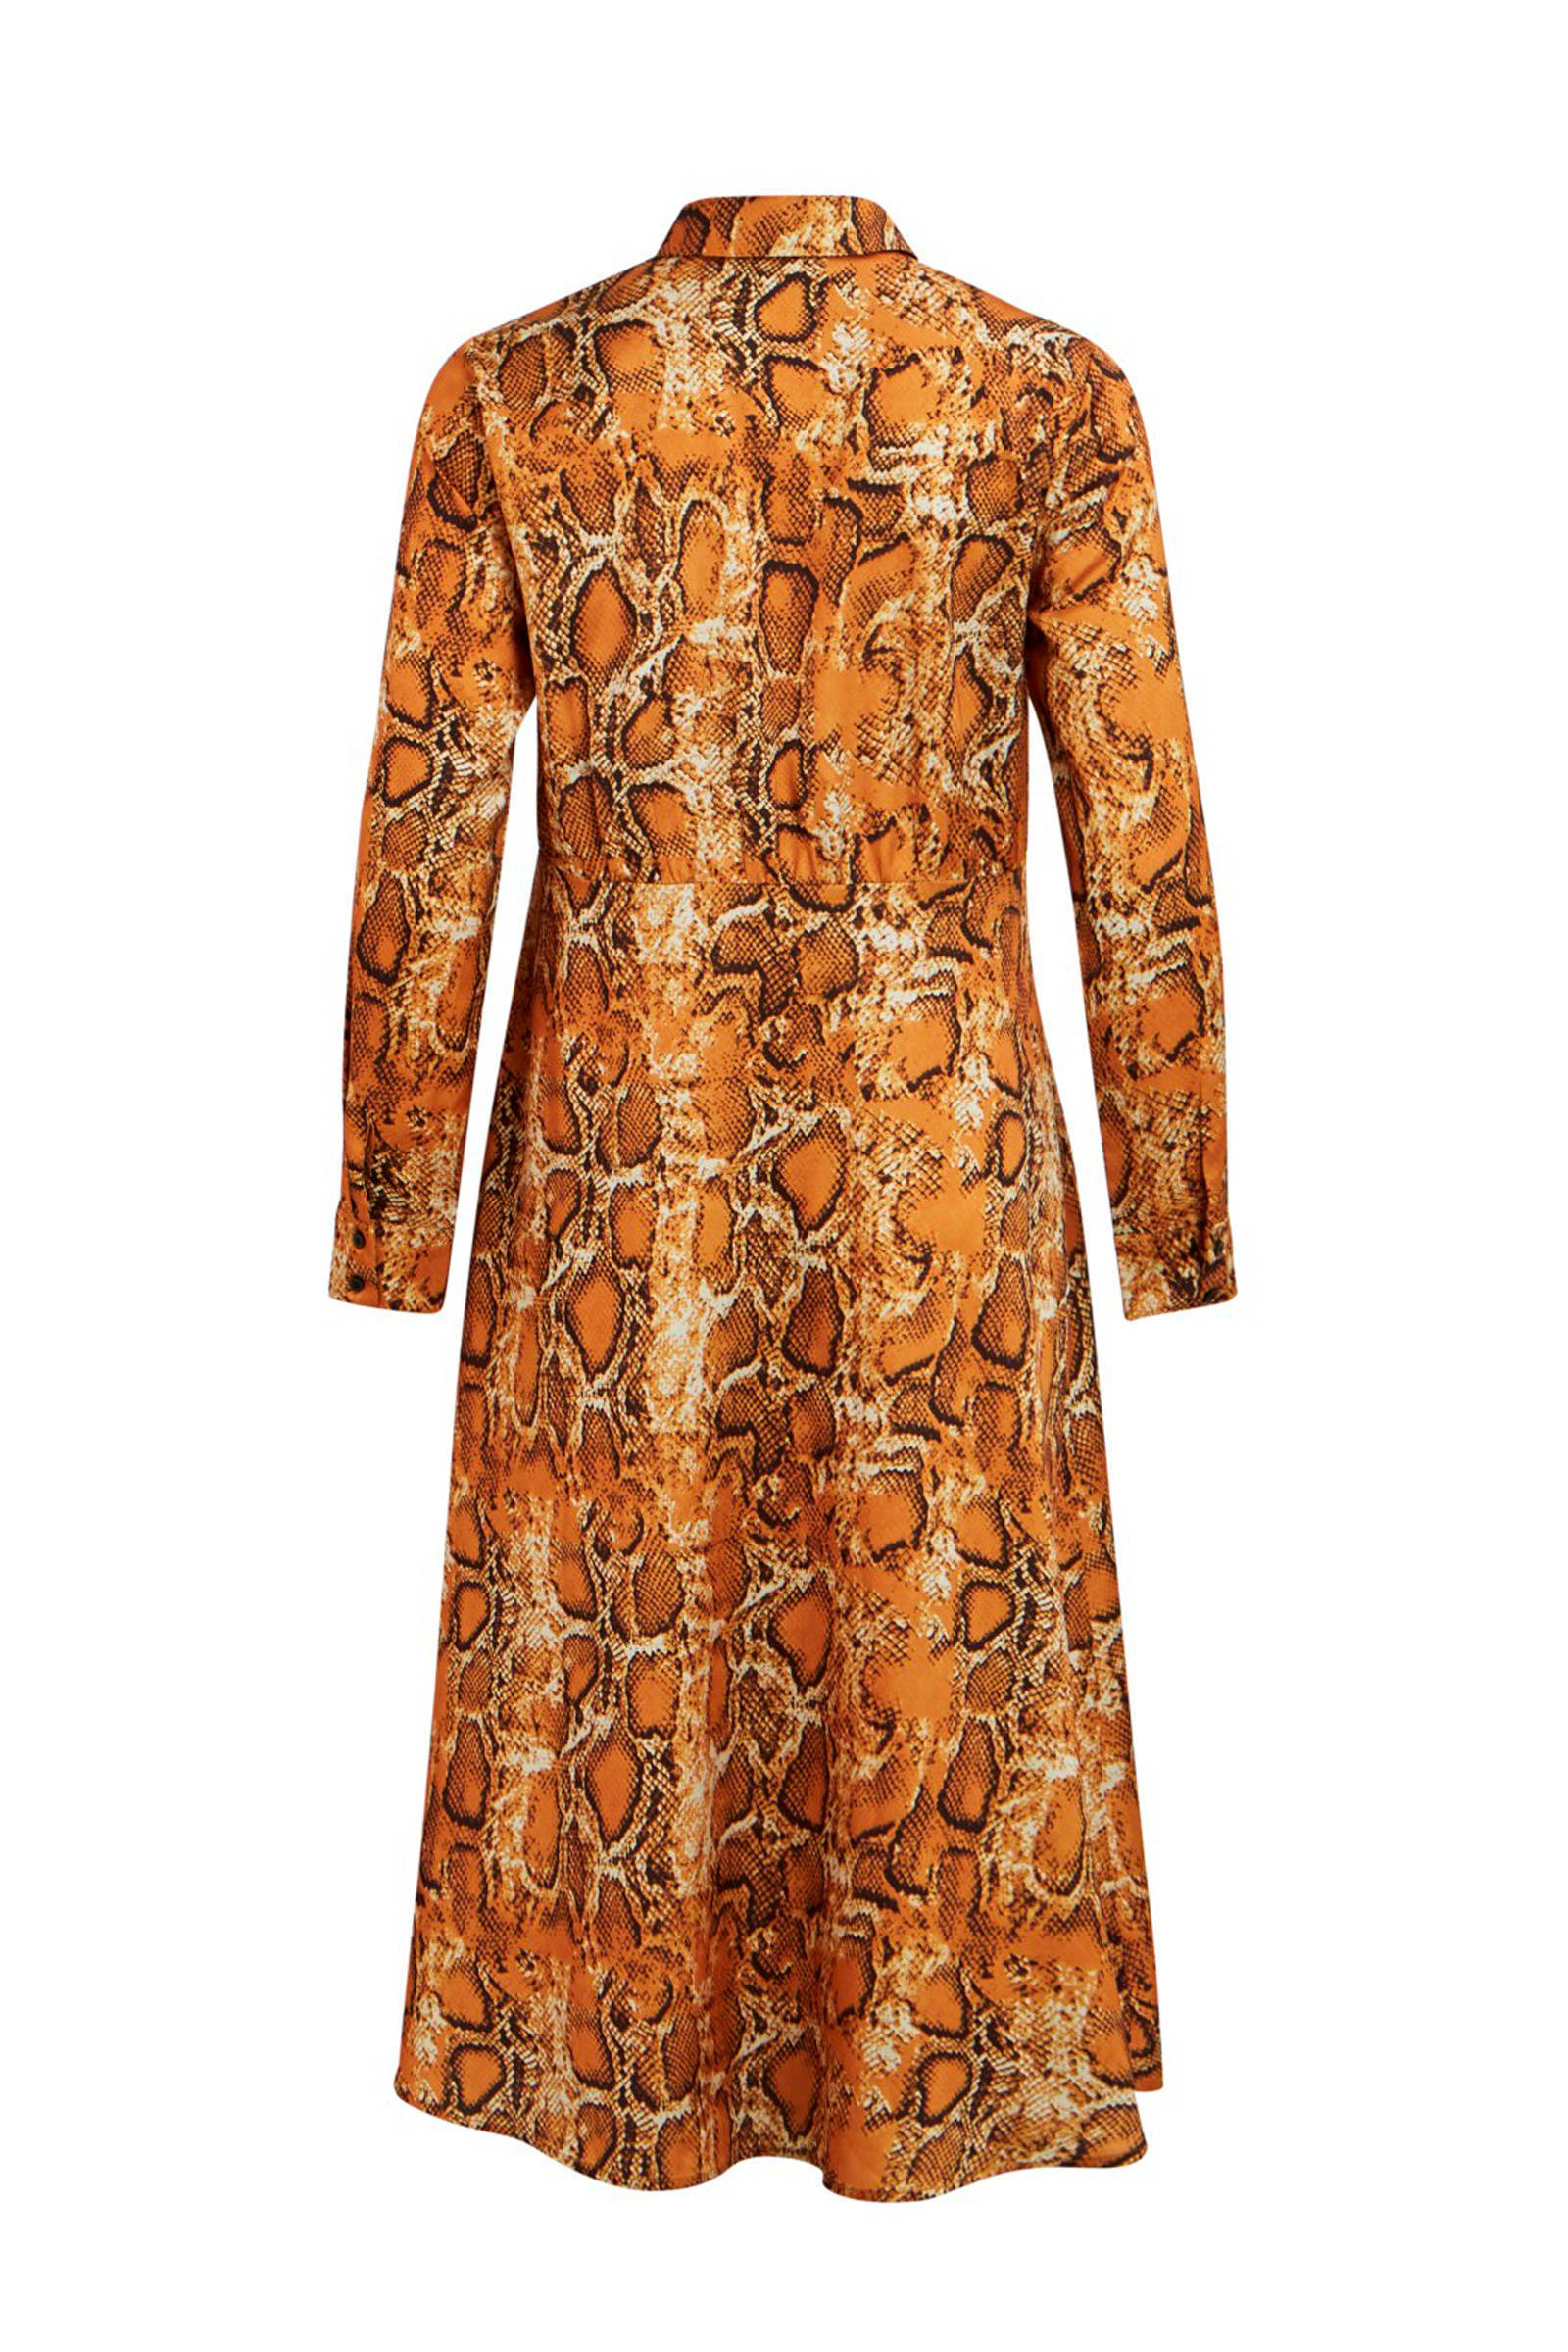 VILA blousejurk VILA blousejurk slangenprint met f57xqzZ